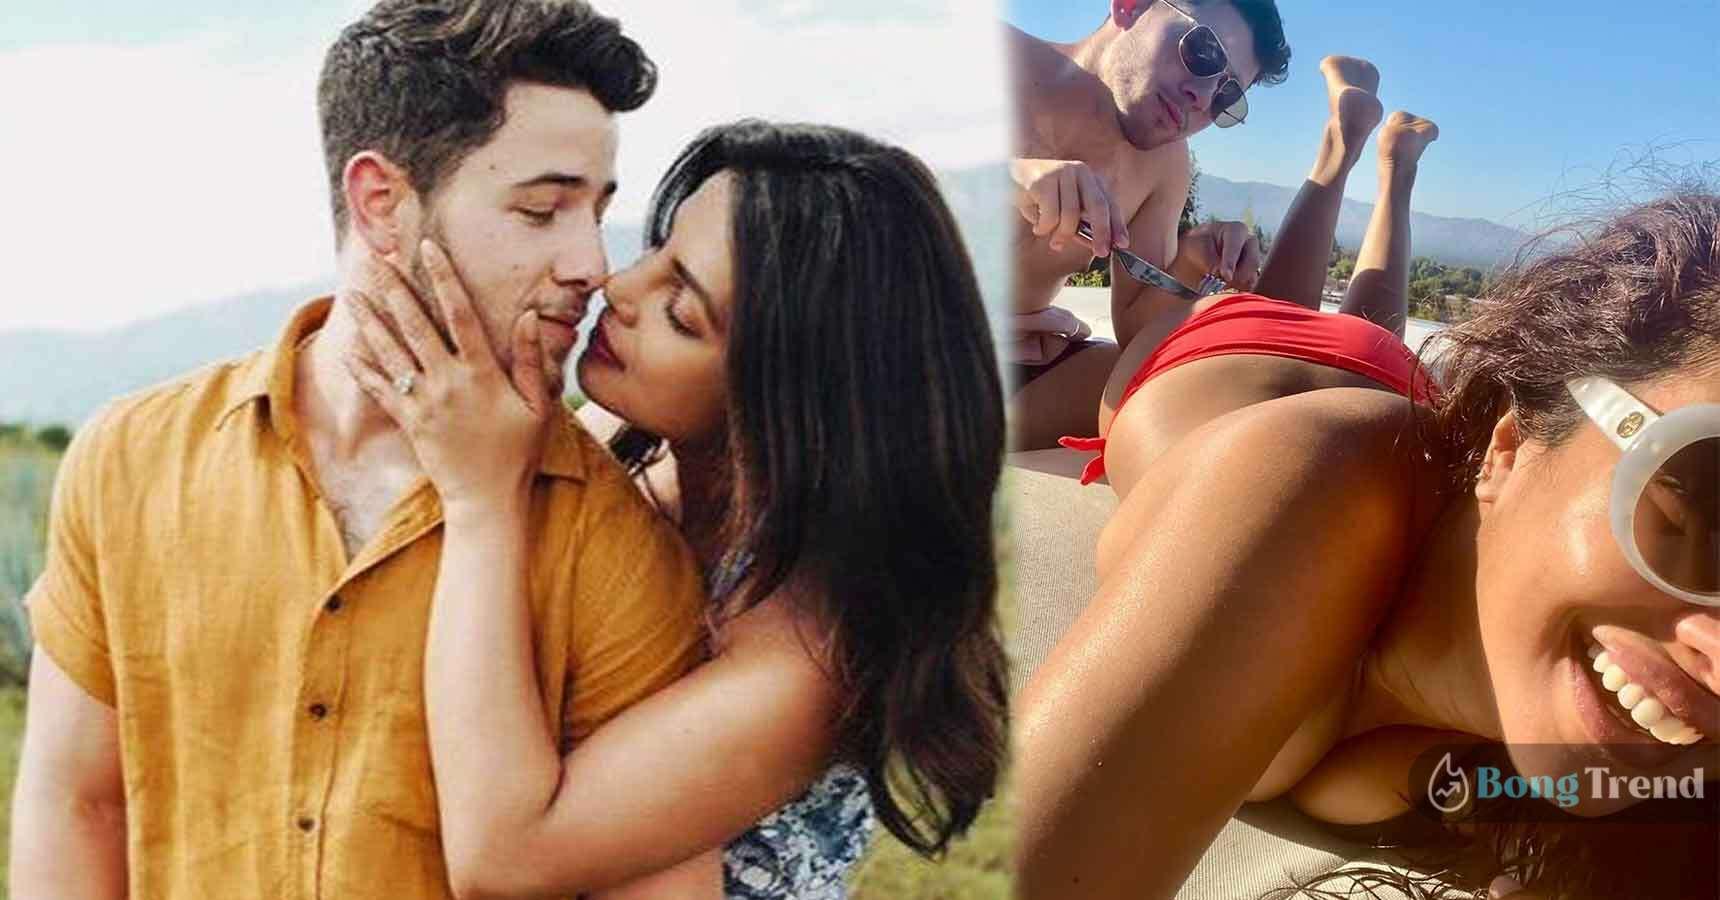 Priyanka Chopra in bikini with Nick Jonas